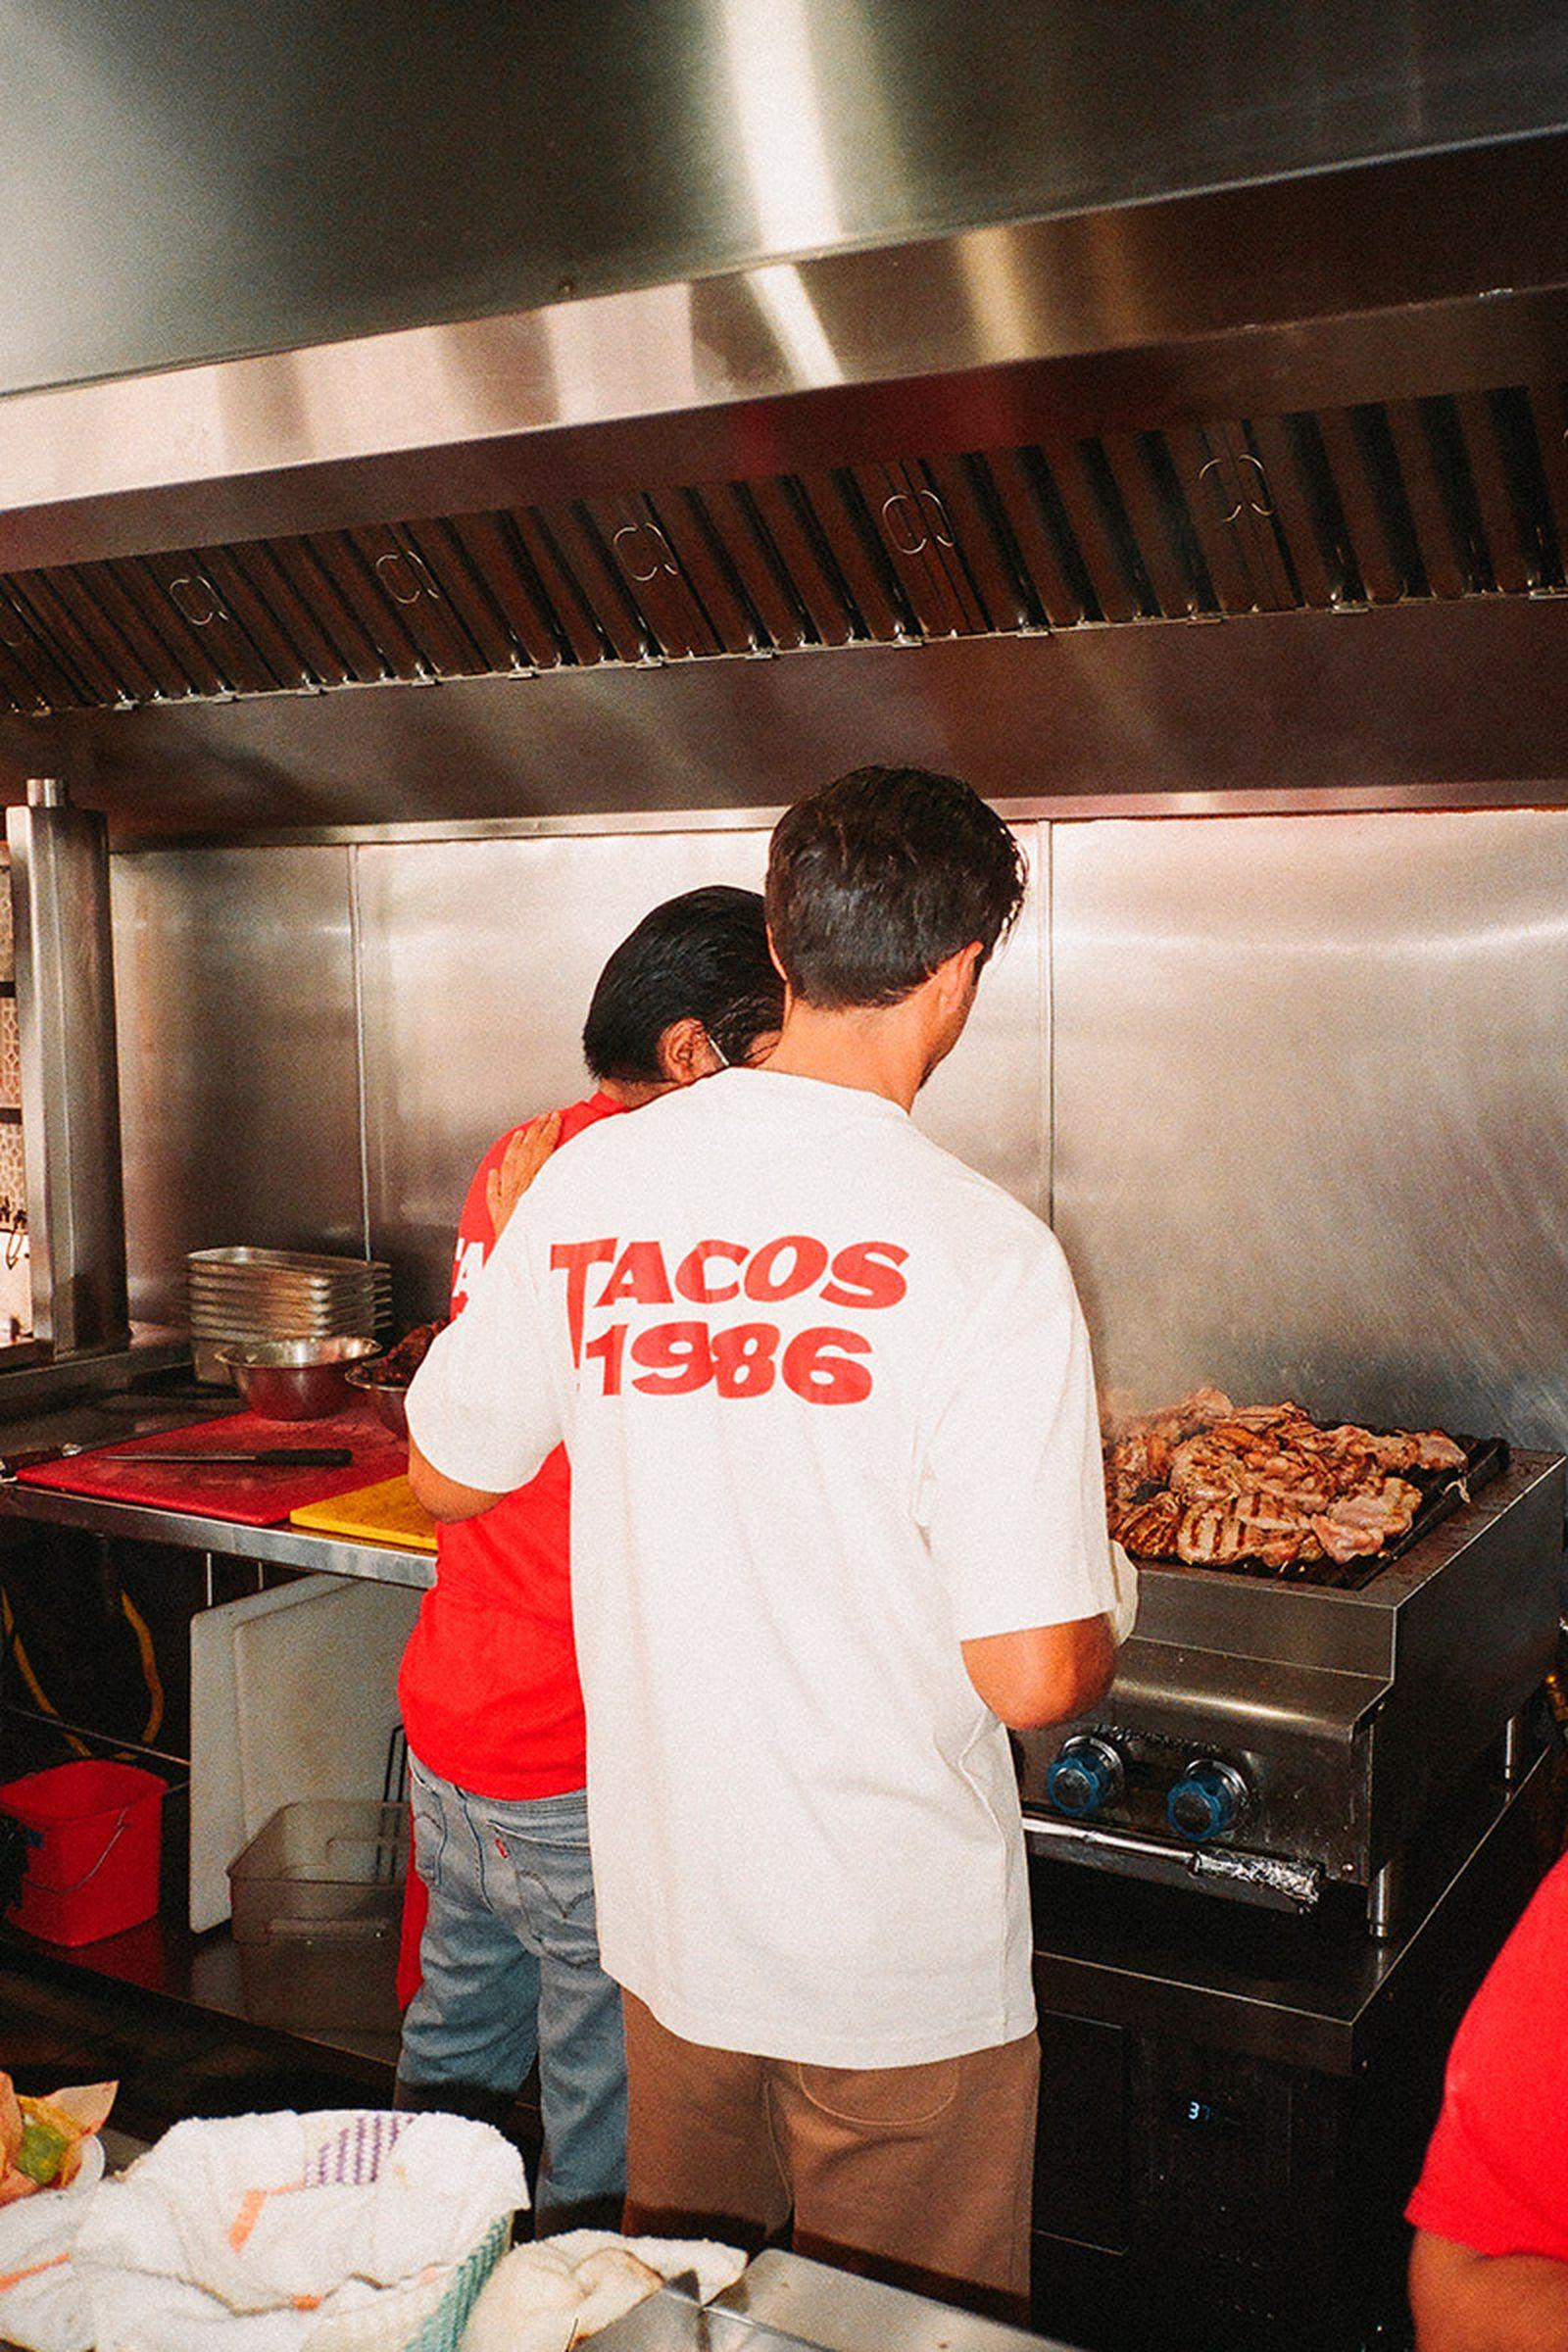 tacos-1986-x-hm-blank-staples-05